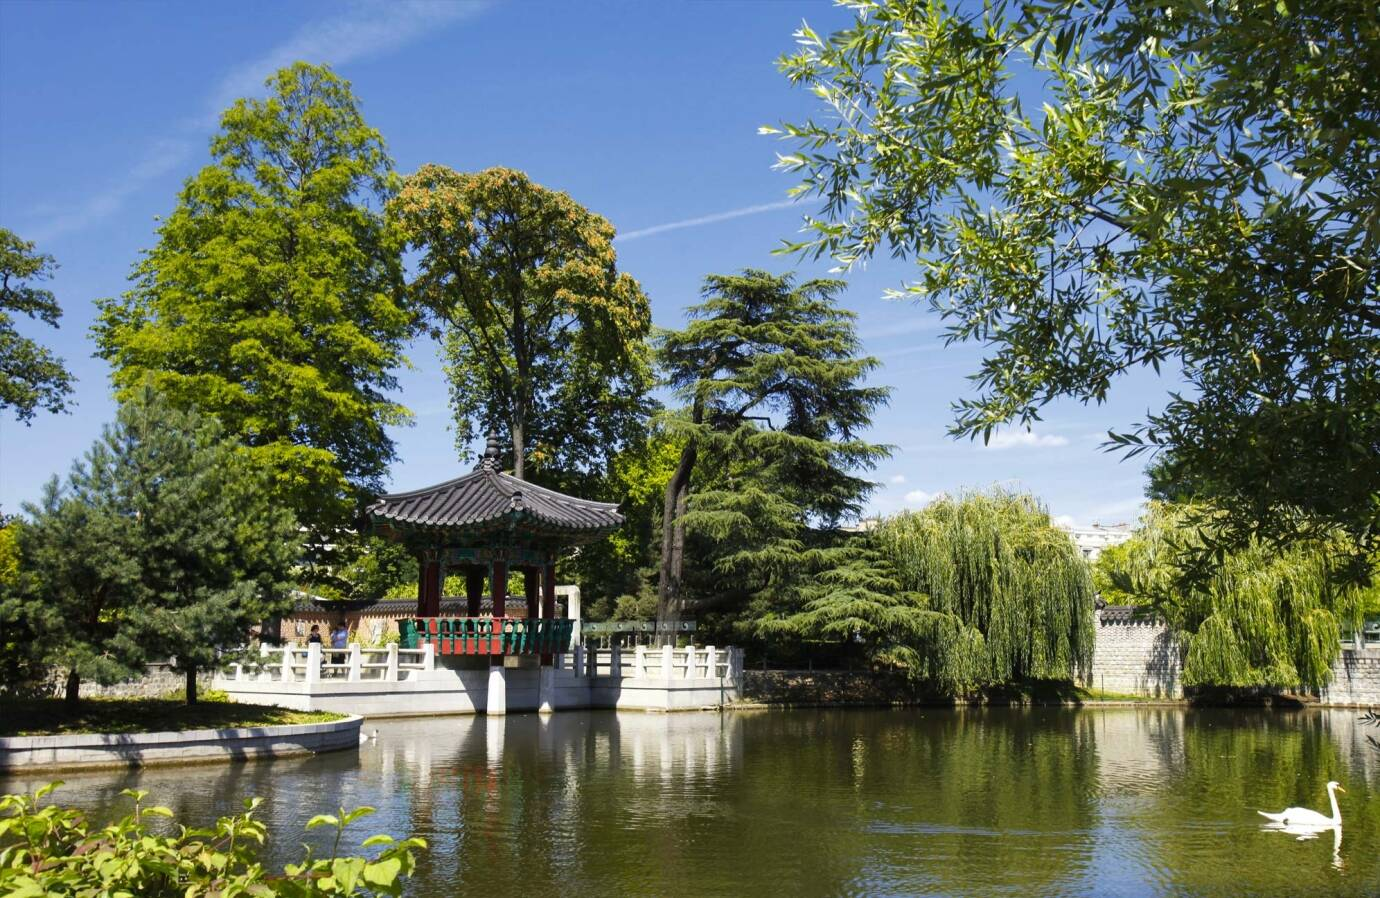 Jardin D Acclimatation A Leisure Facility And Theme Park In Paris